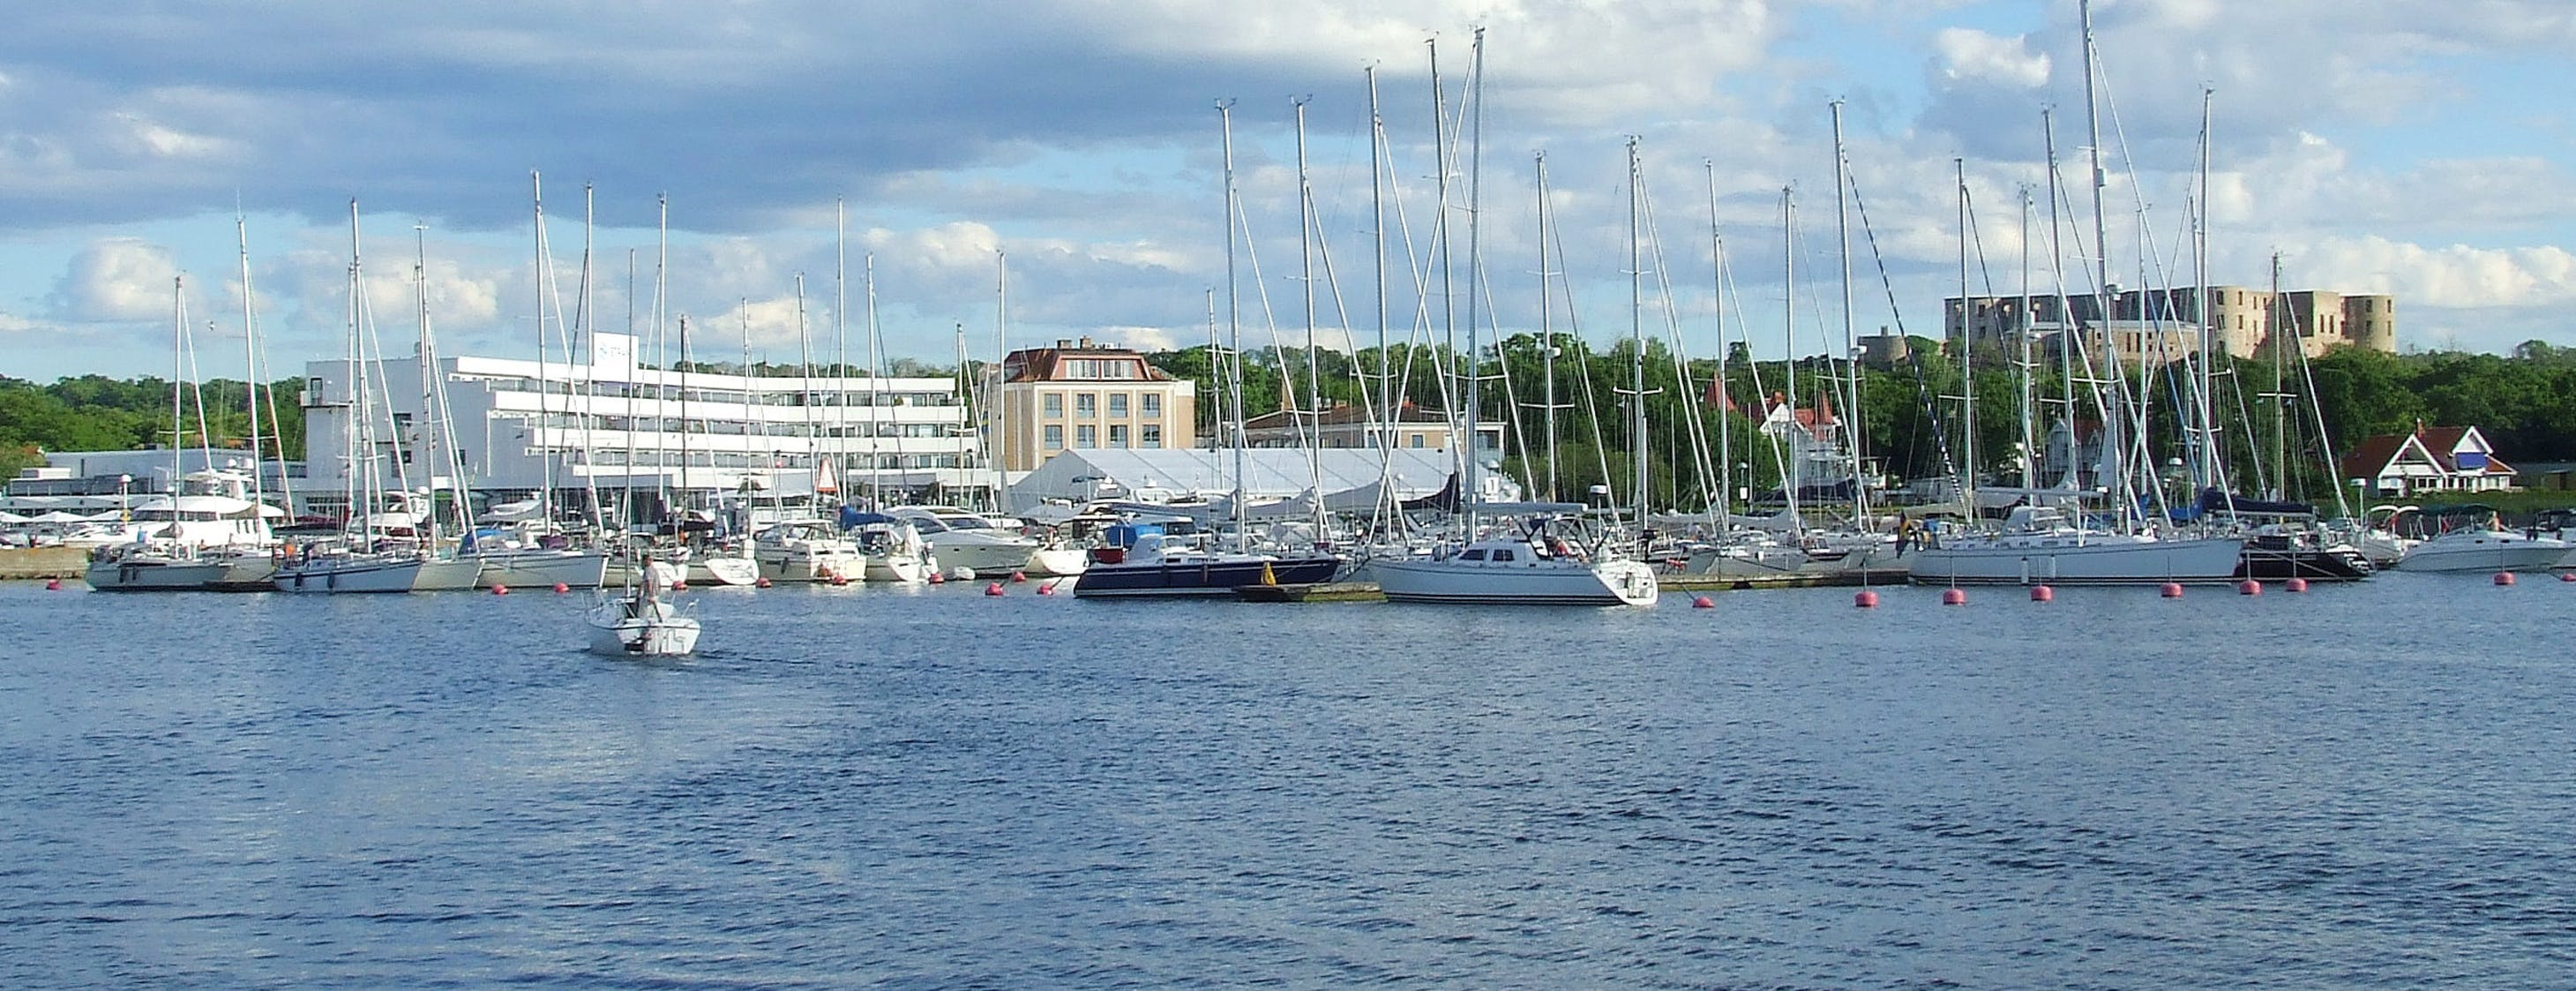 Villagatan 4 Borgholm